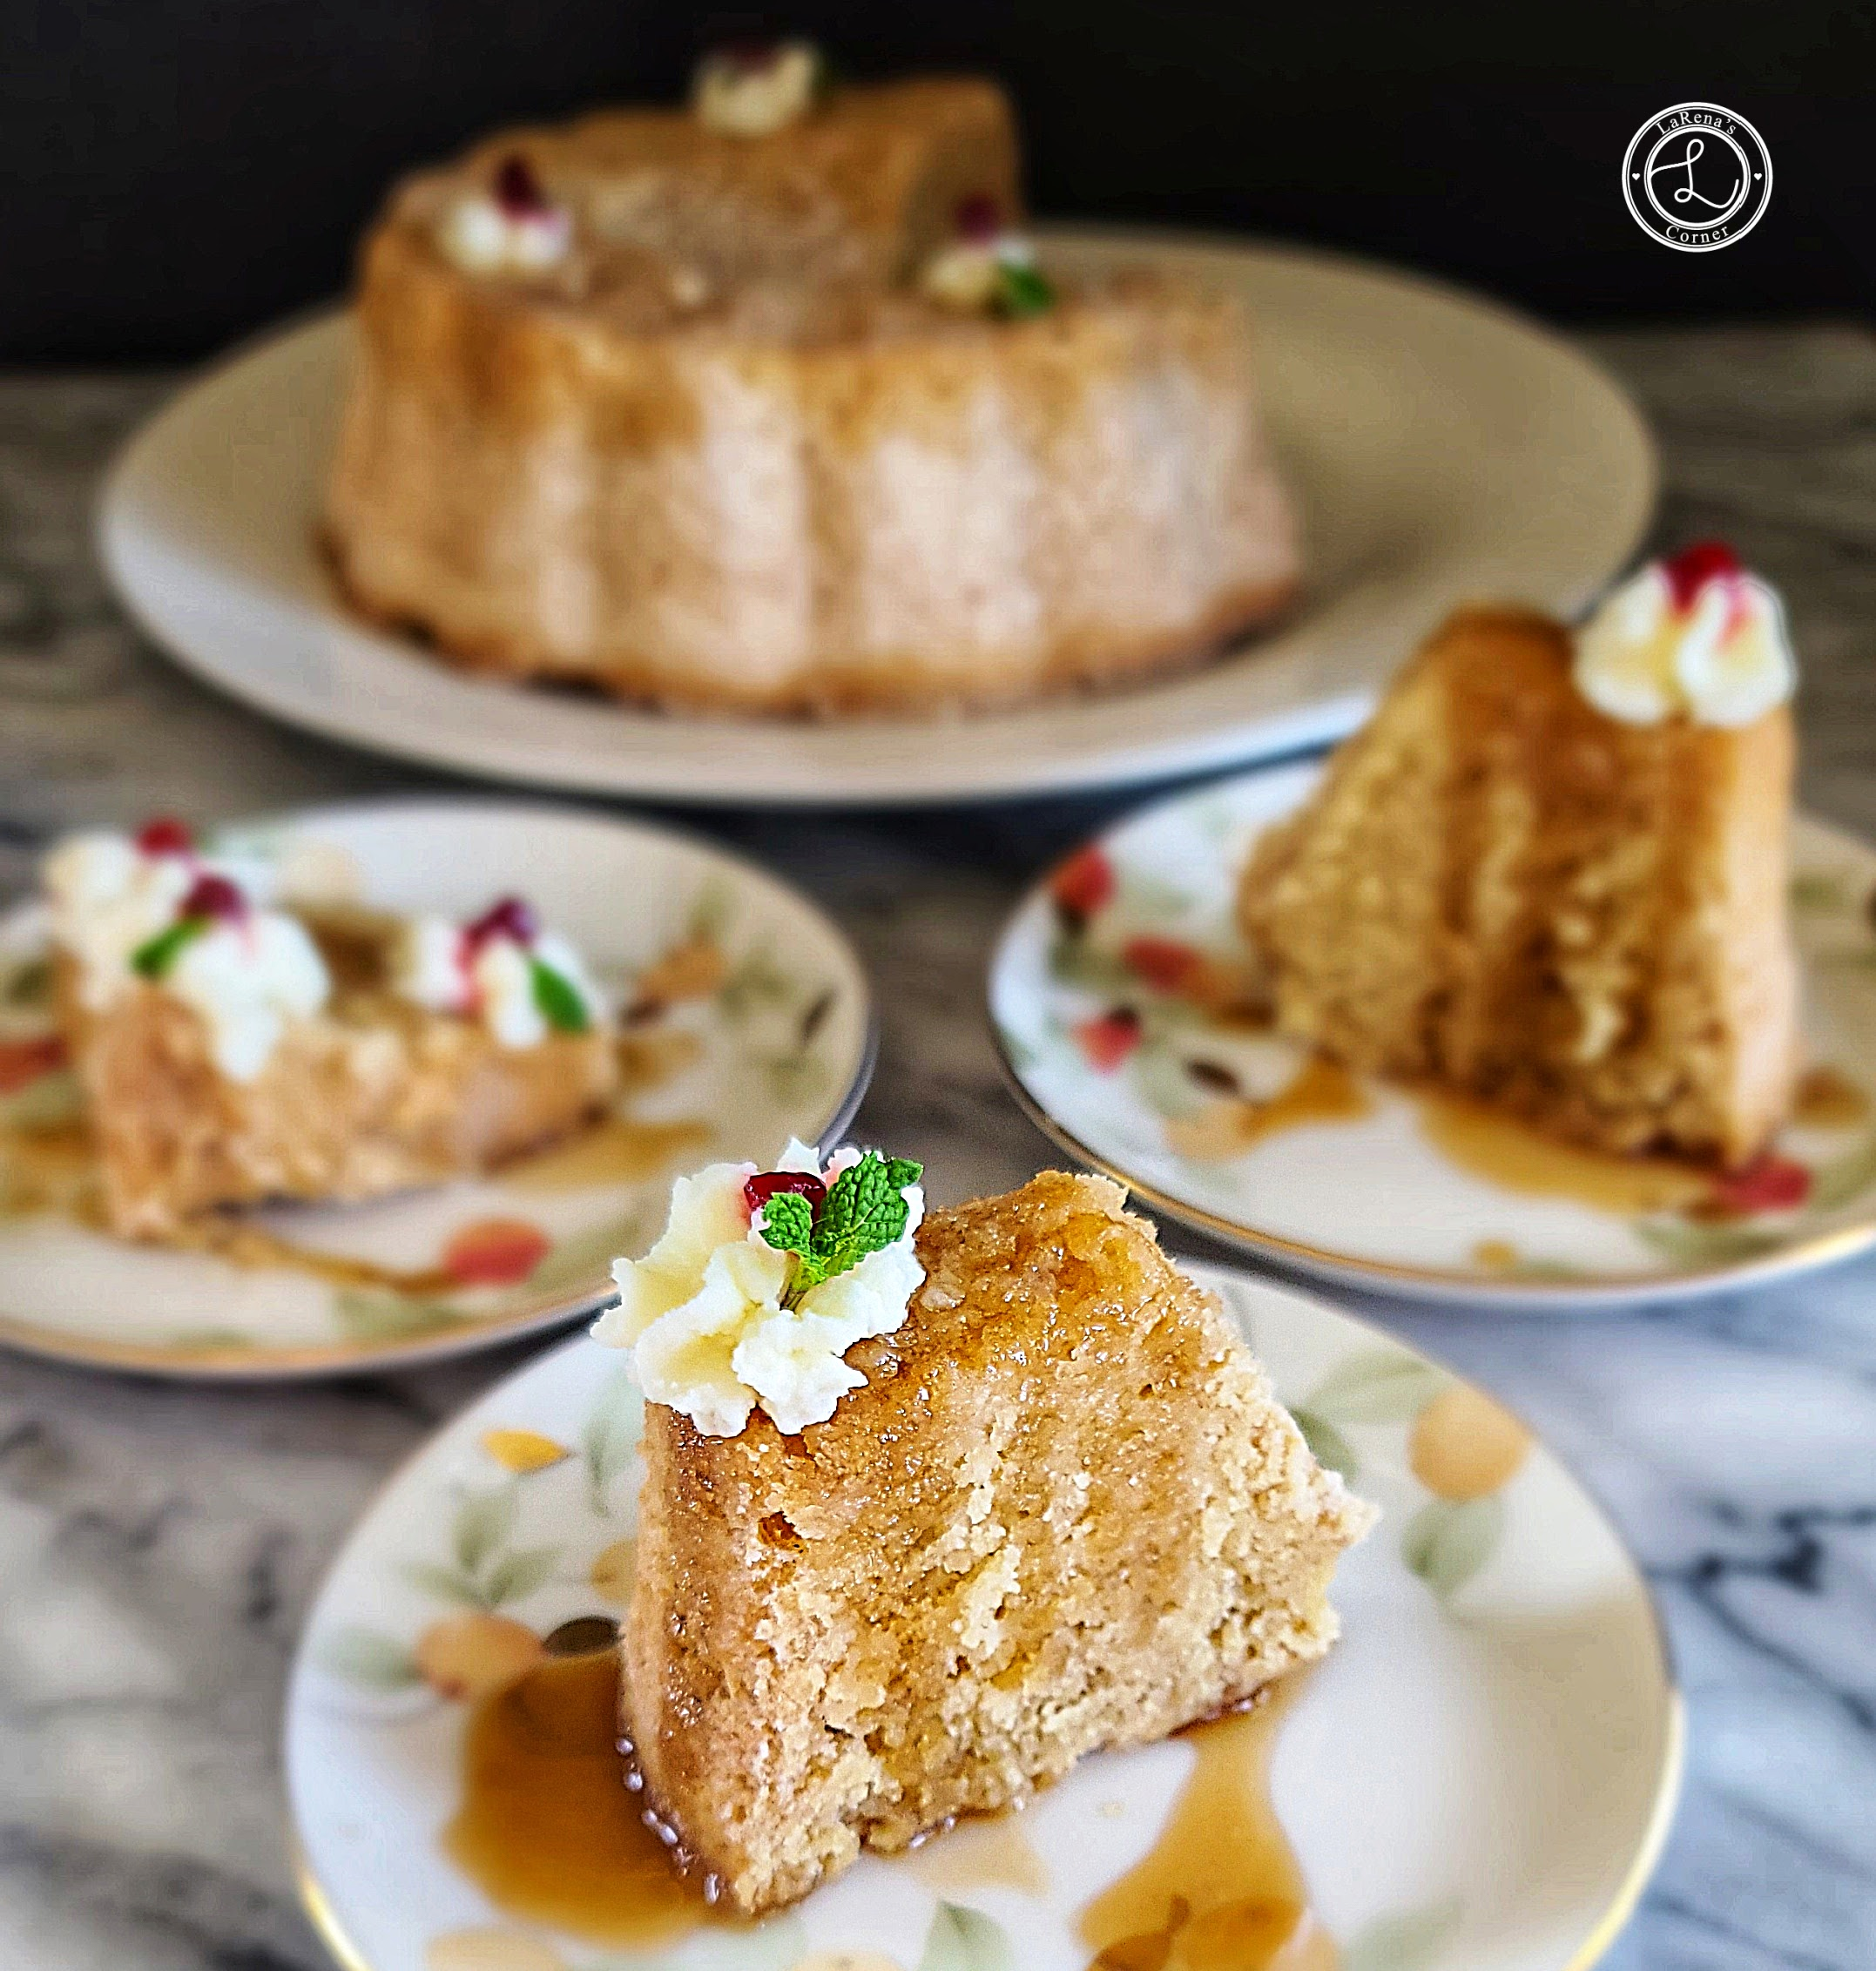 Cake a 3 slices of Gluten-Free Homemade Rum Cake